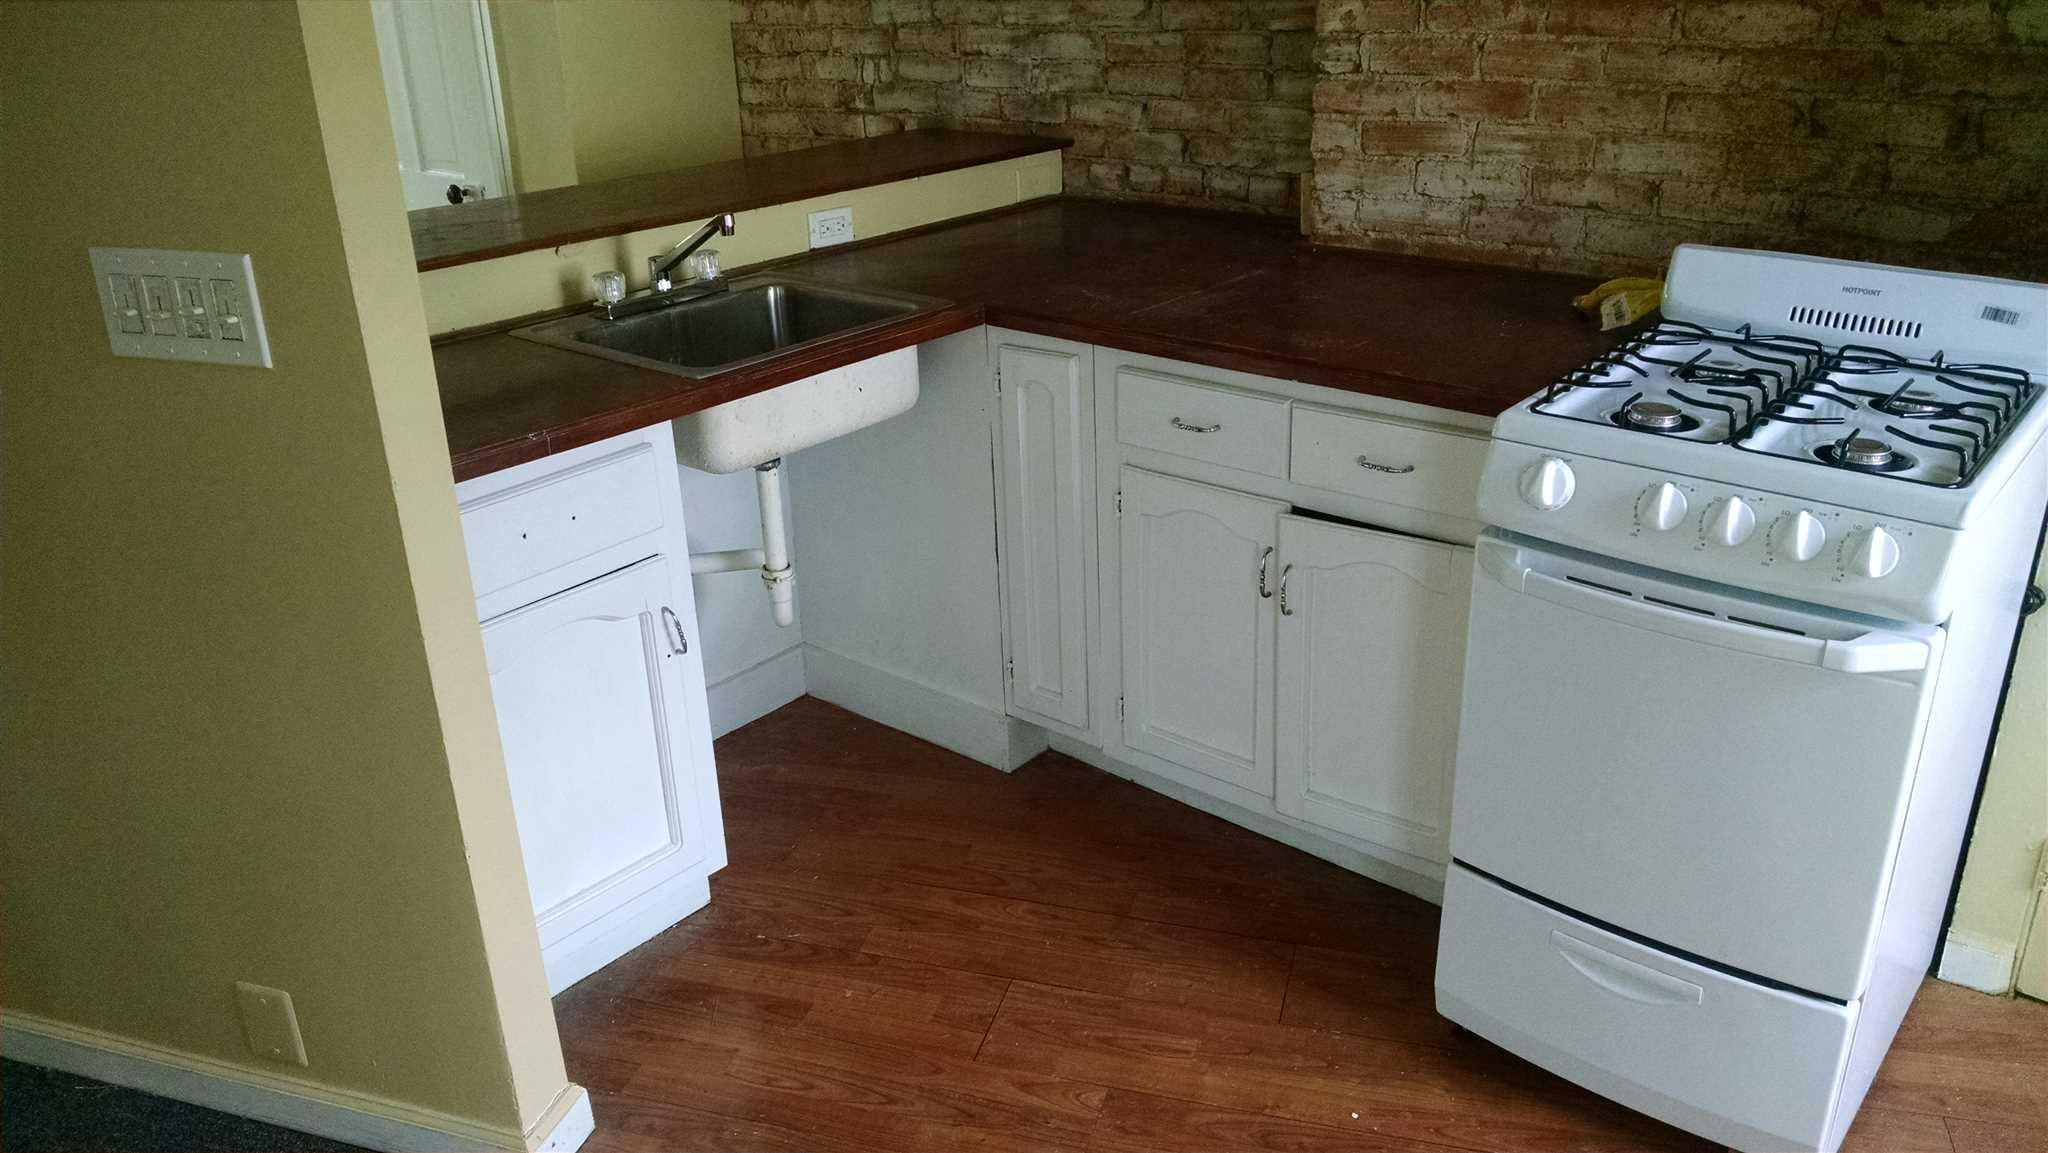 Additional photo for property listing at 82 GARDEN Street 82 GARDEN Street Poughkeepsie, New York 12601 United States